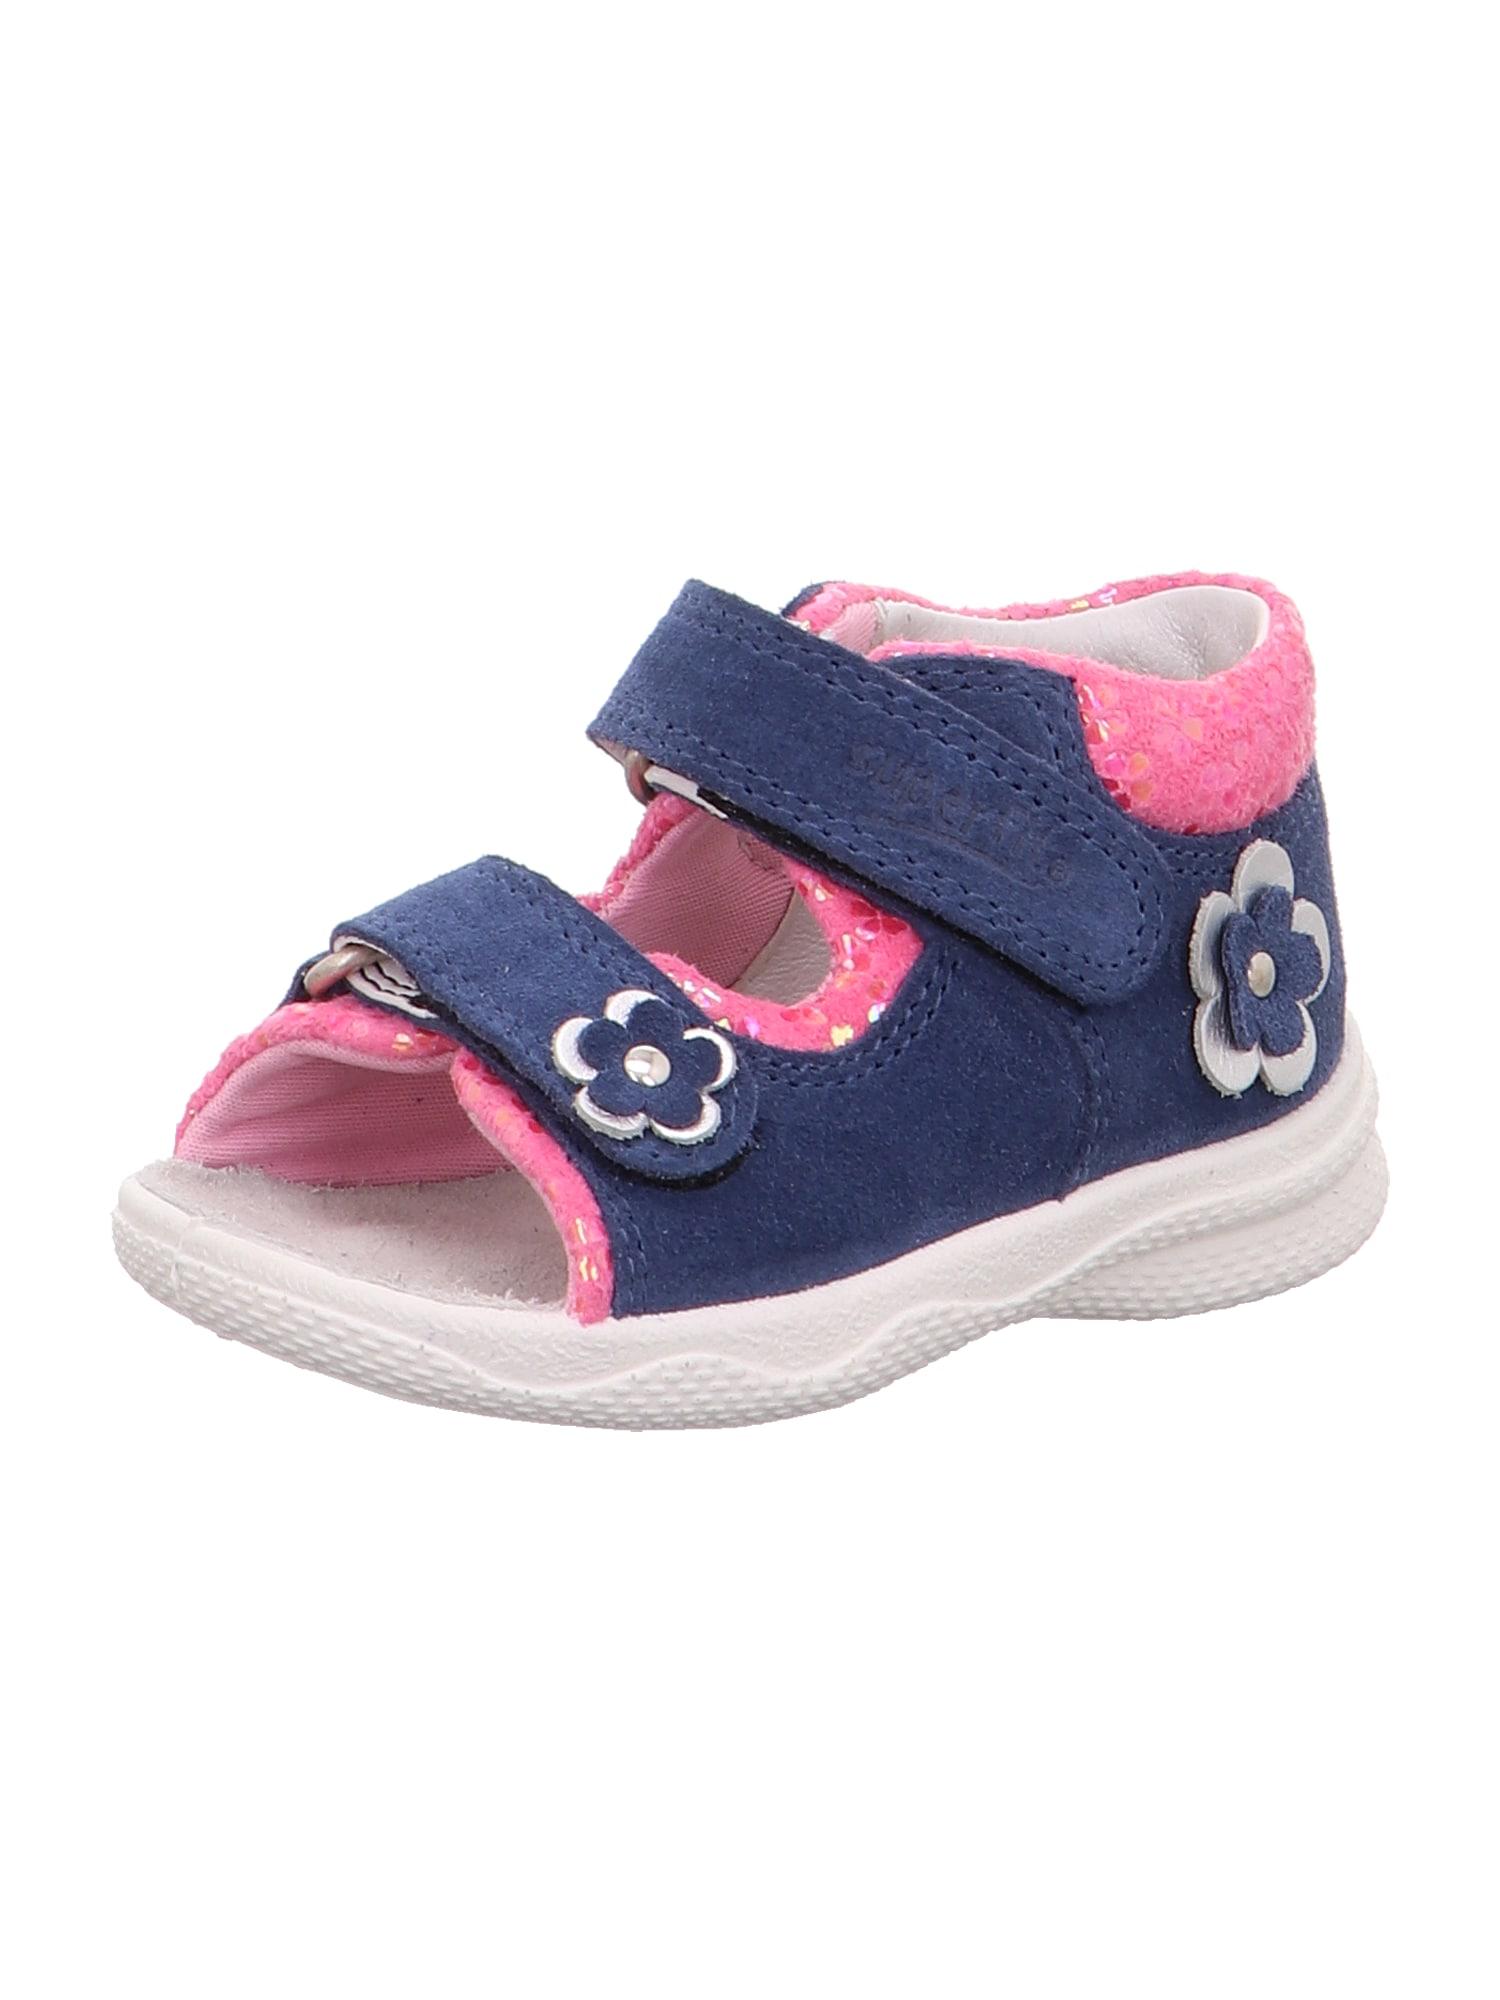 SUPERFIT Sandalai 'POLLY' rožių spalva / mėlyna